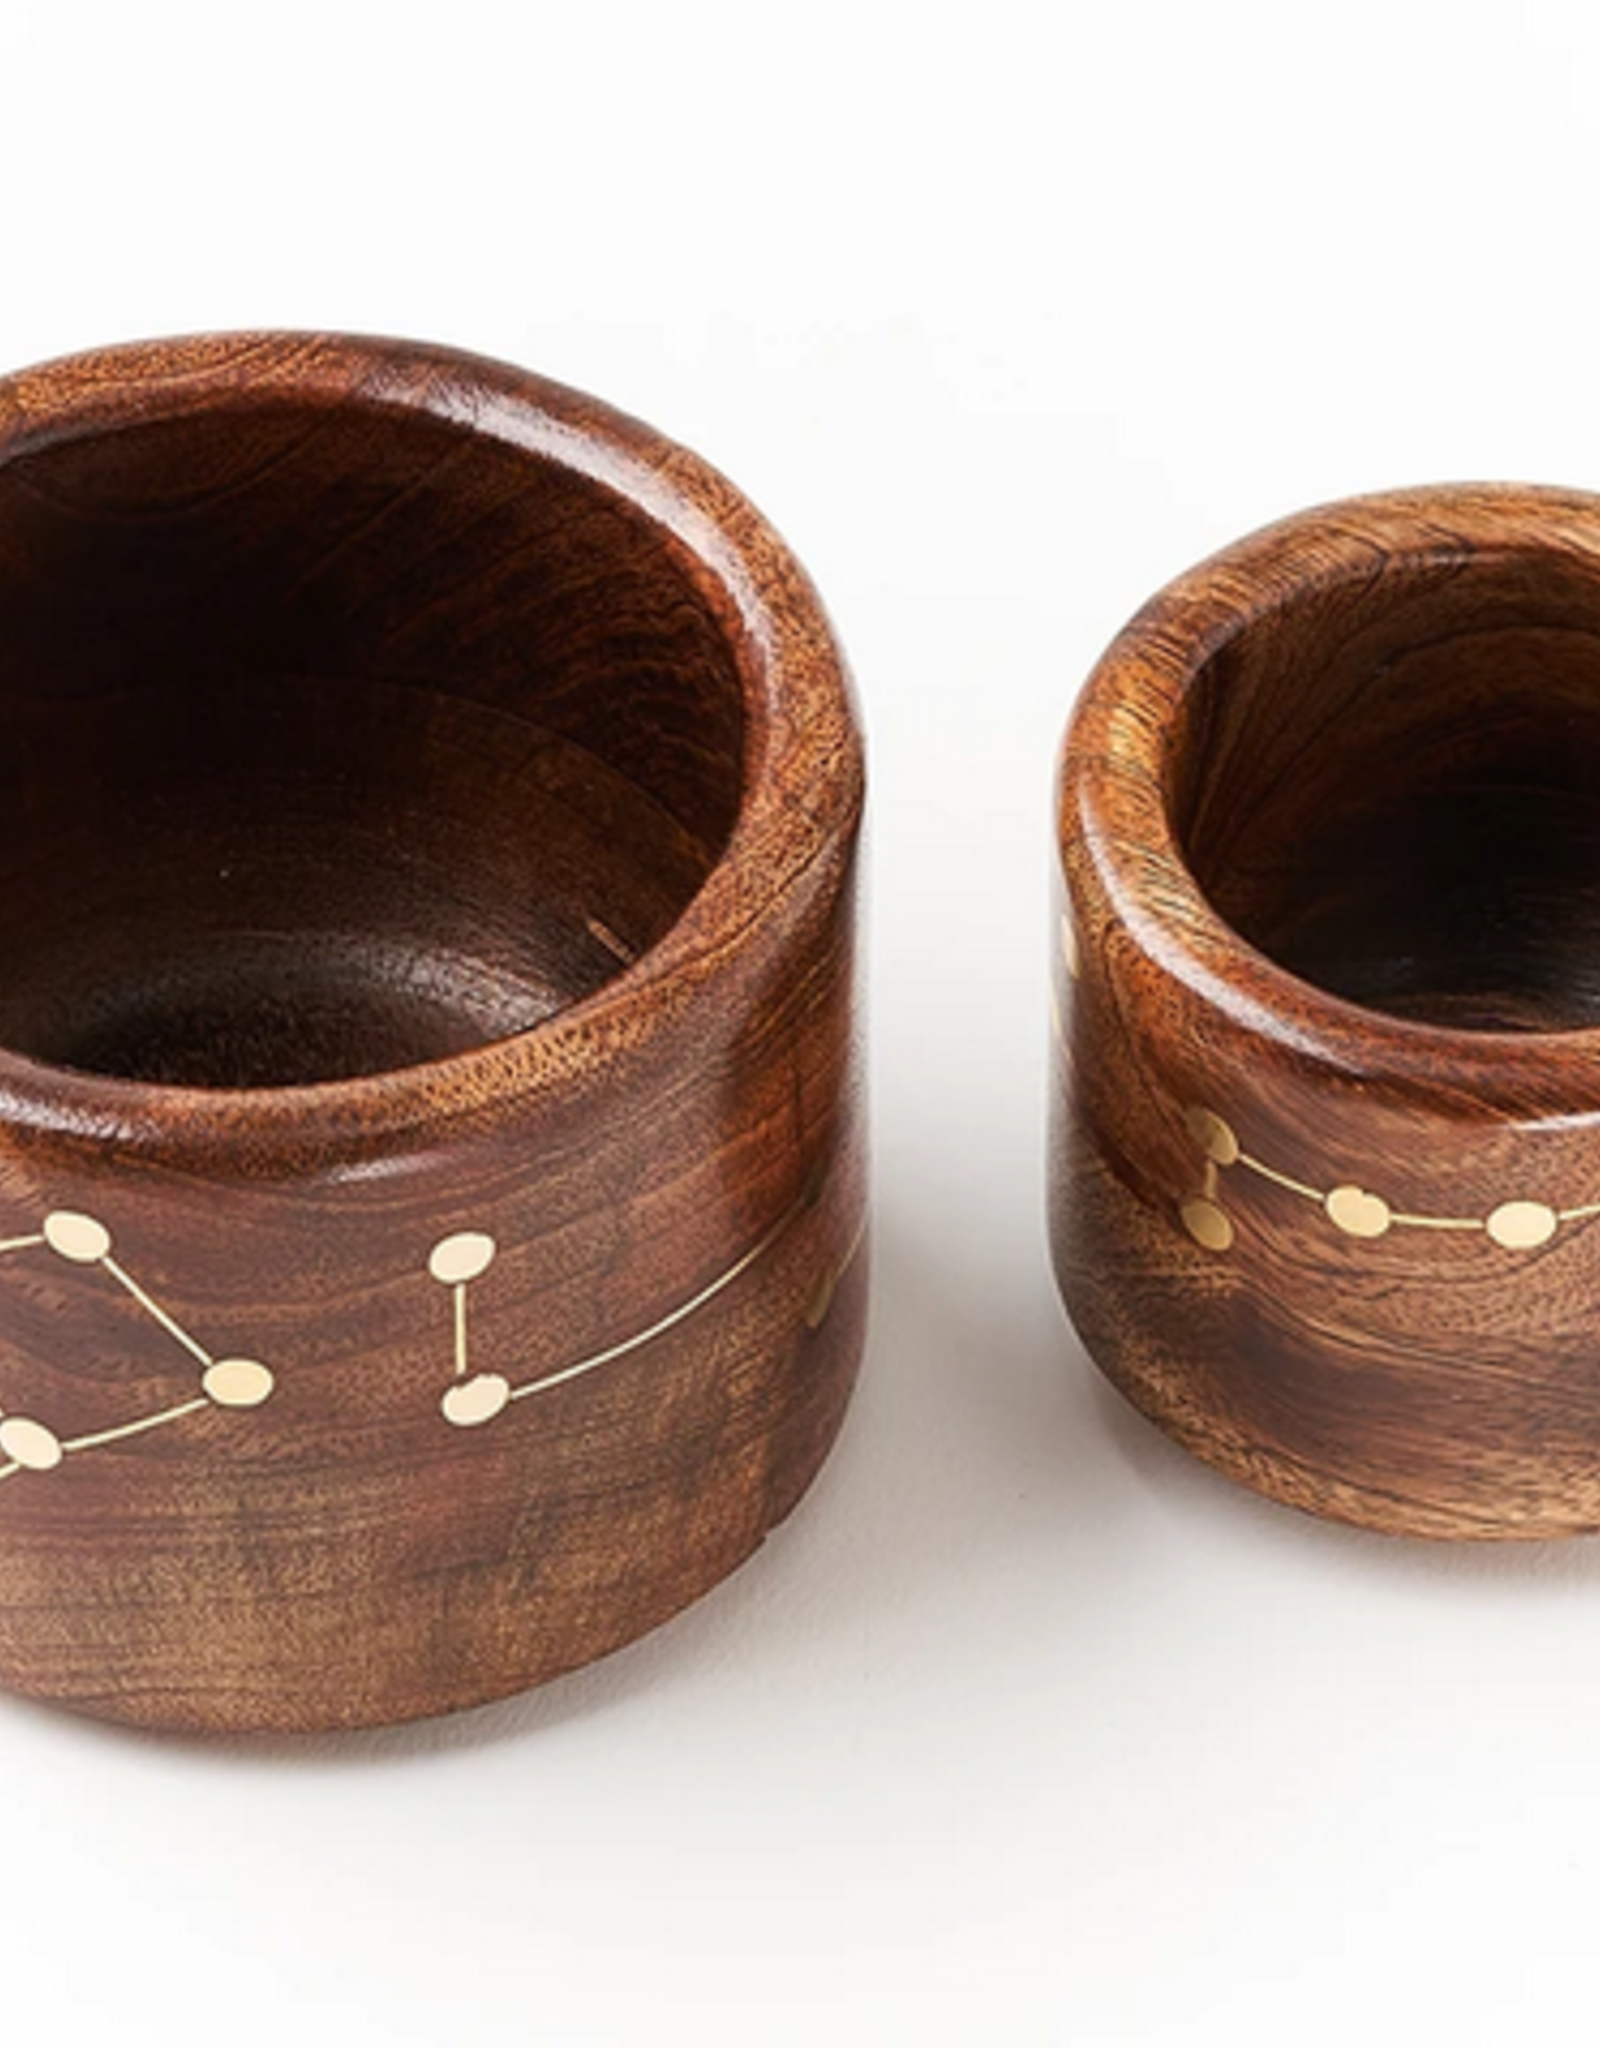 Matr Boomie *Jyotisha Nesting Bowls